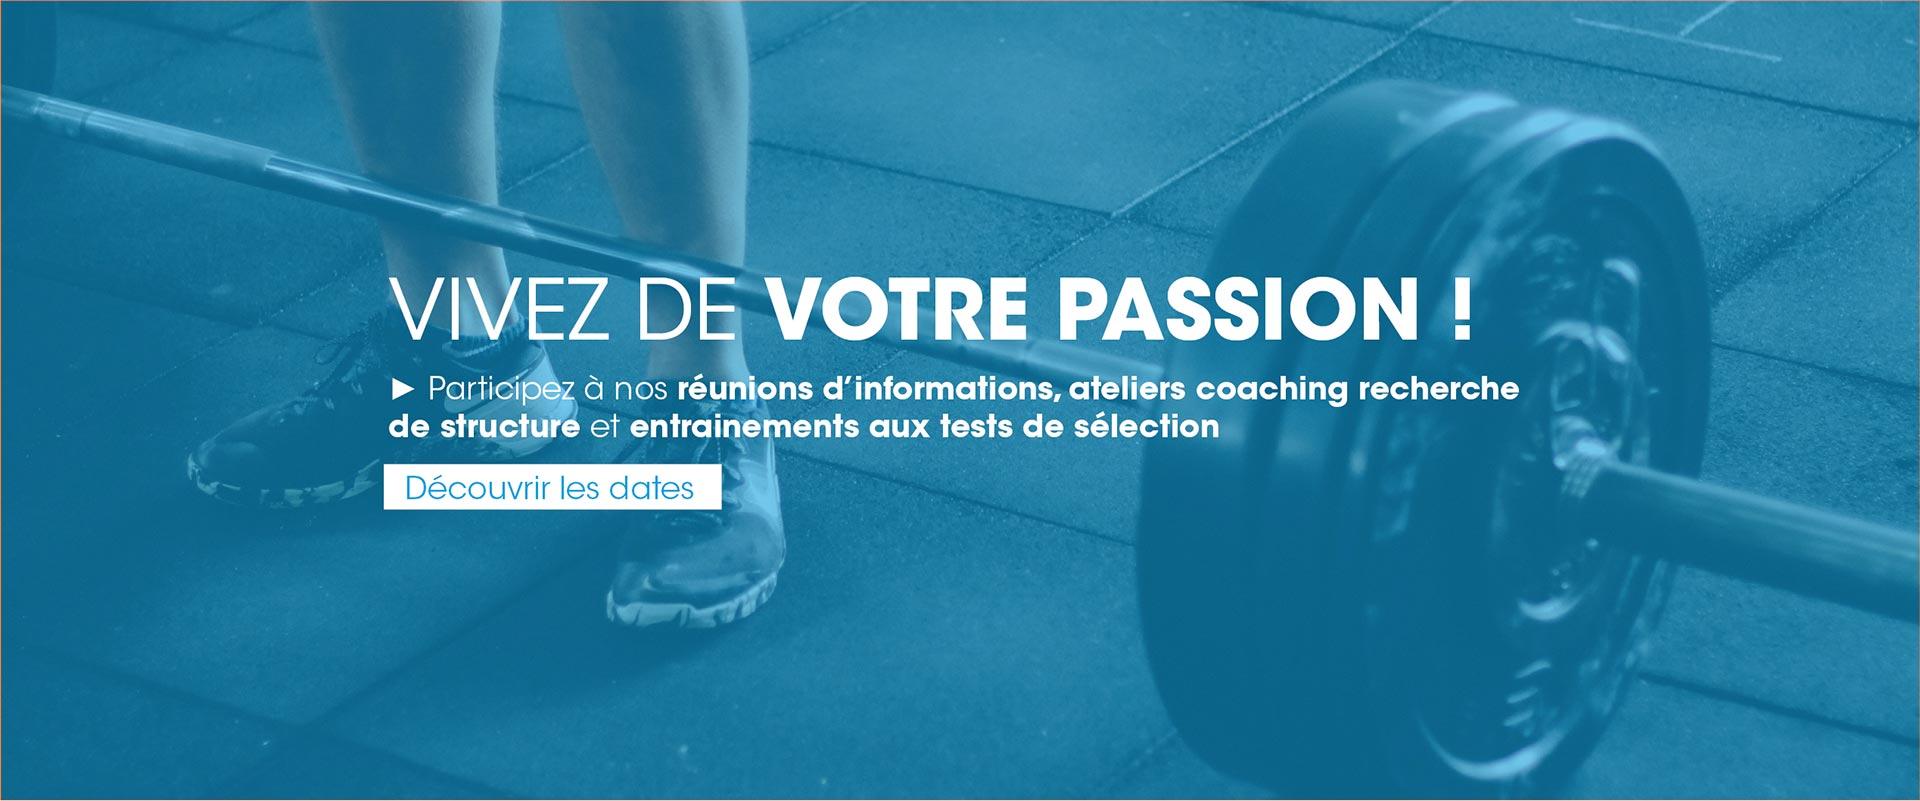 recherche structure sport en alternance apprentissage mulhouse alsace